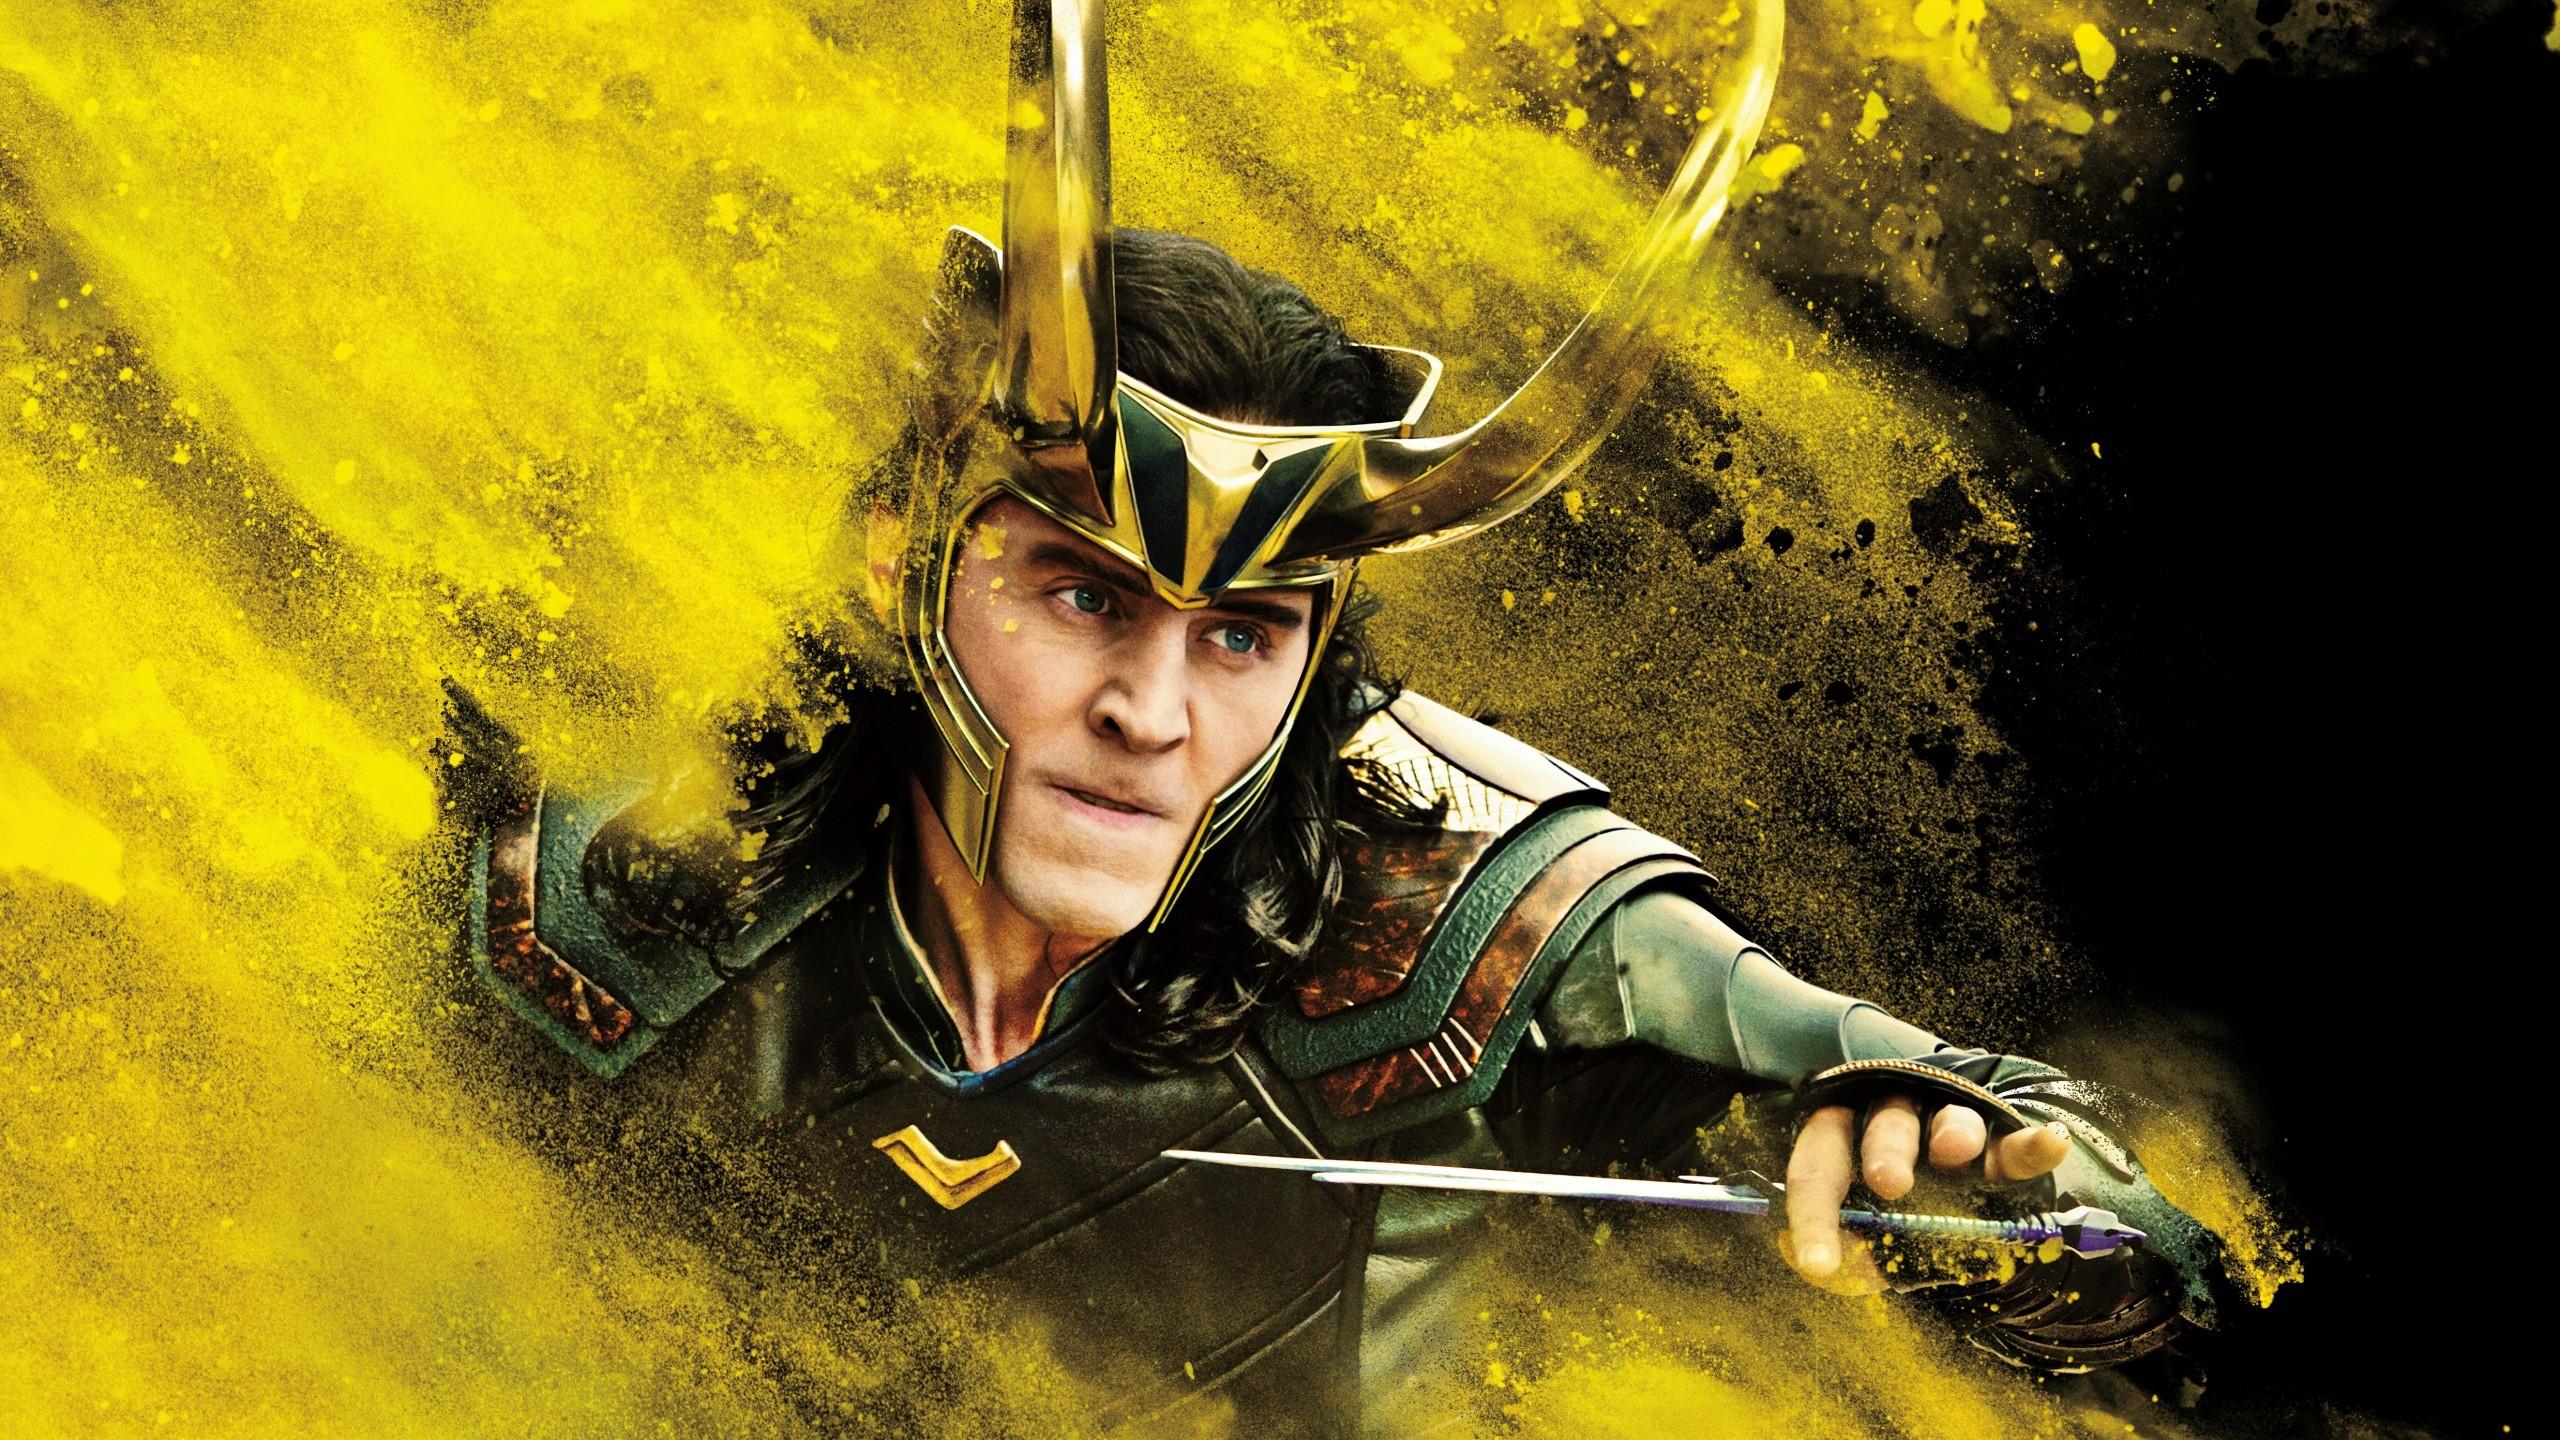 Res: 2560x1440, Movies / Thor Ragnarok Wallpaper